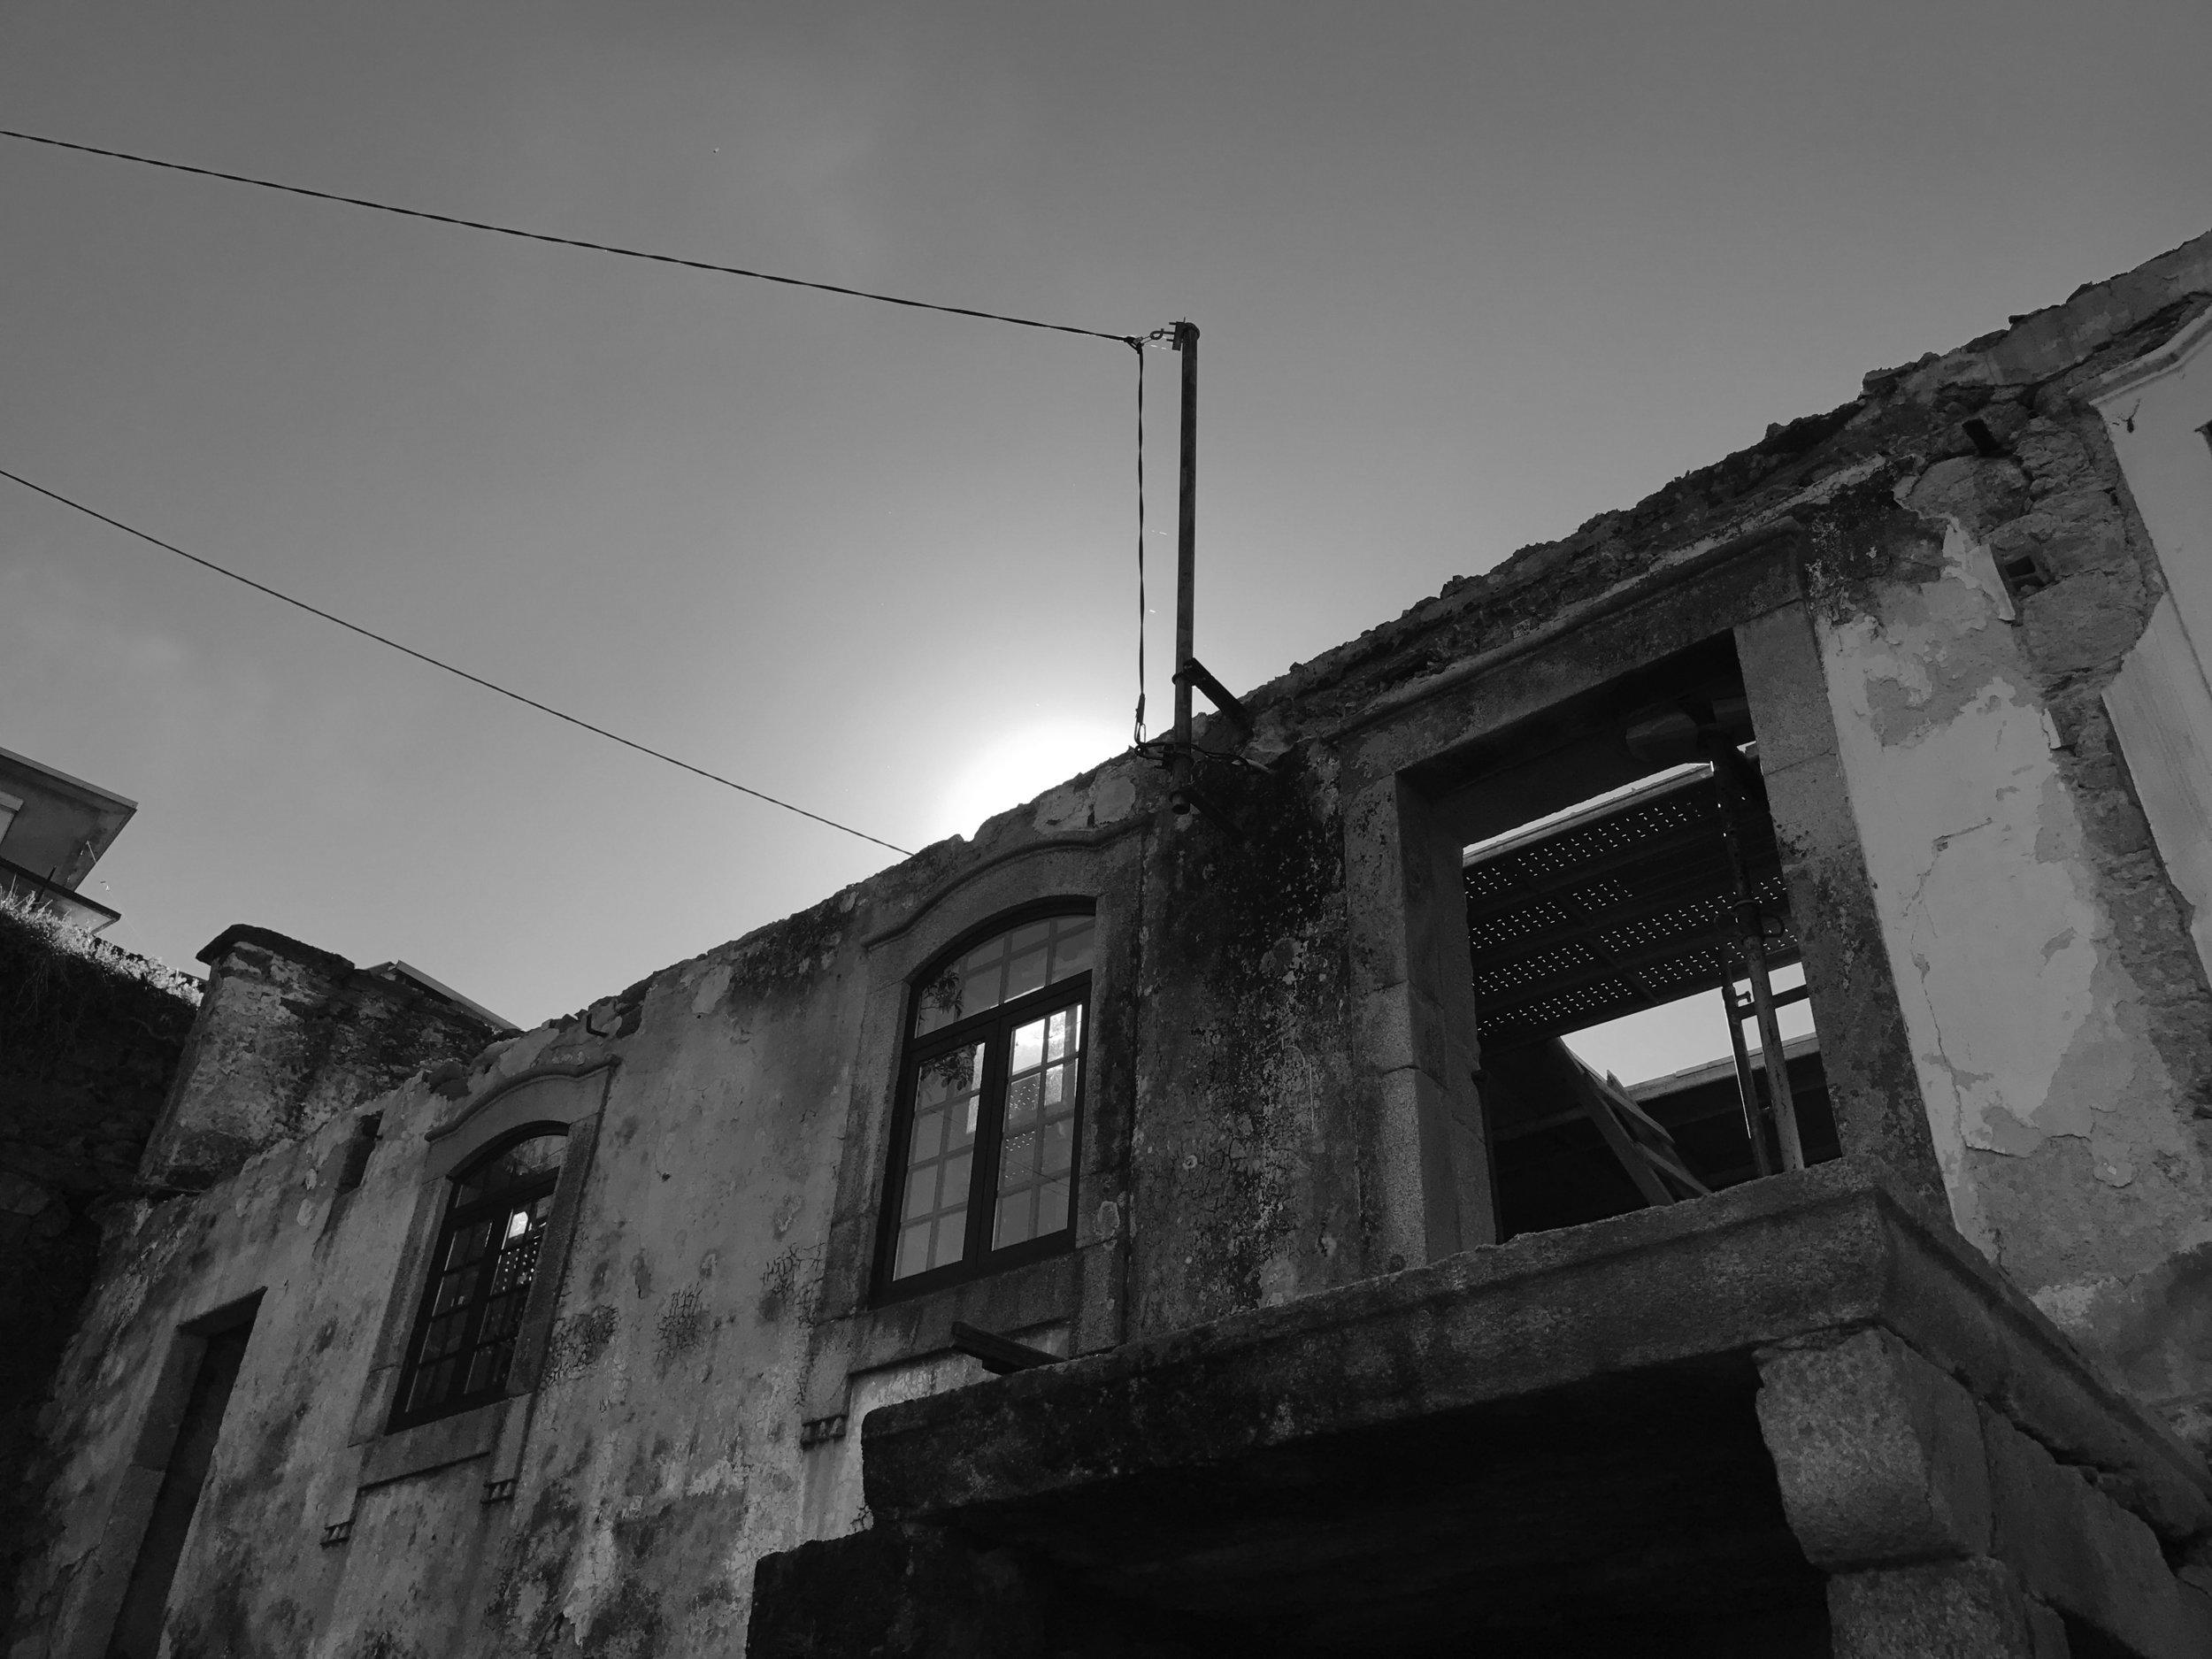 Moradia Folgorosa - Vale de Cambra - EVA atelier - Arquitectura - Obra - Arquitecto - Porto - EVA evolutionary architecture (22).jpg